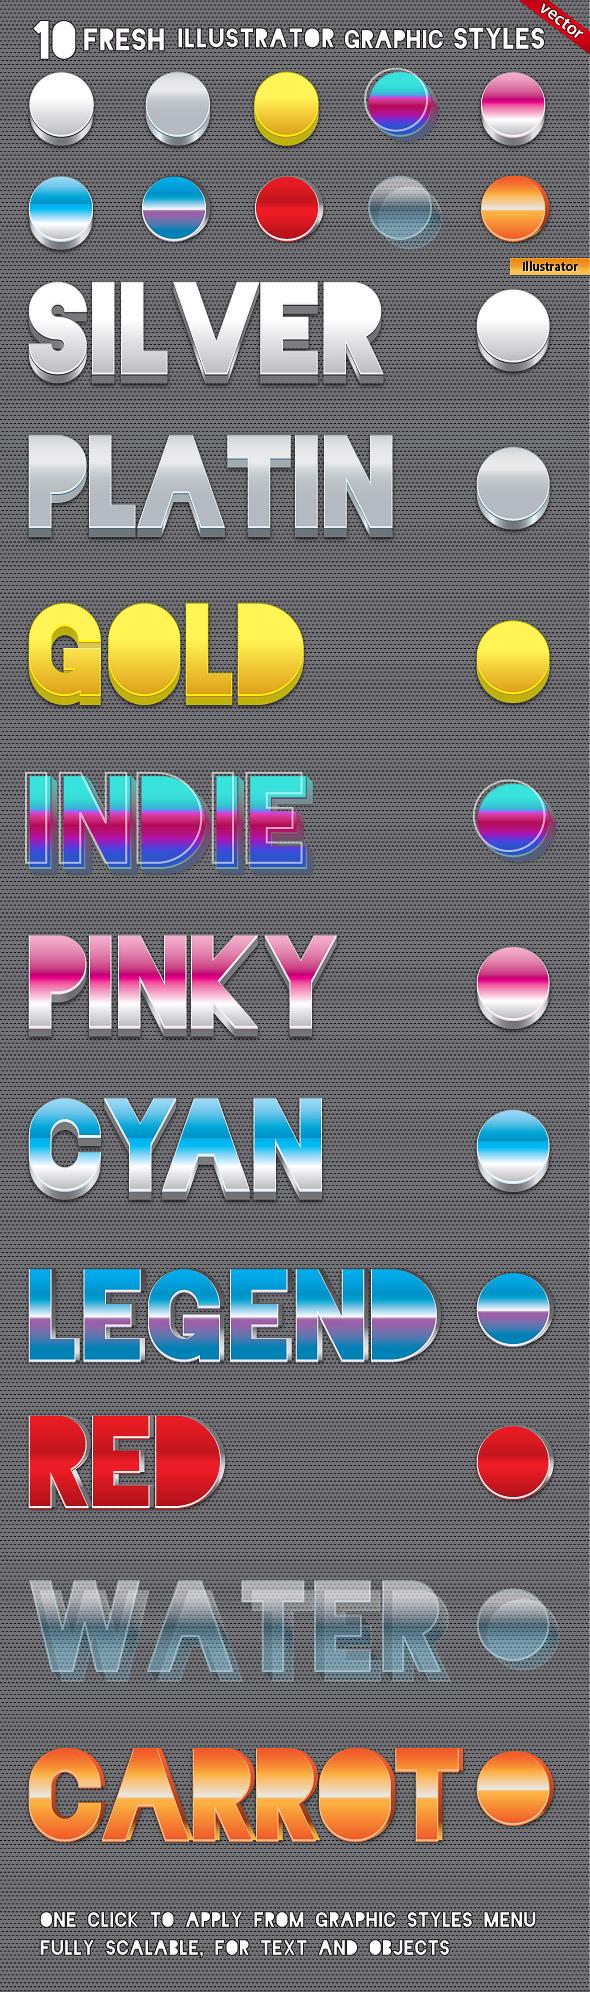 10 3D Fresh Illustrator Graphic Styles - Styles Illustrator